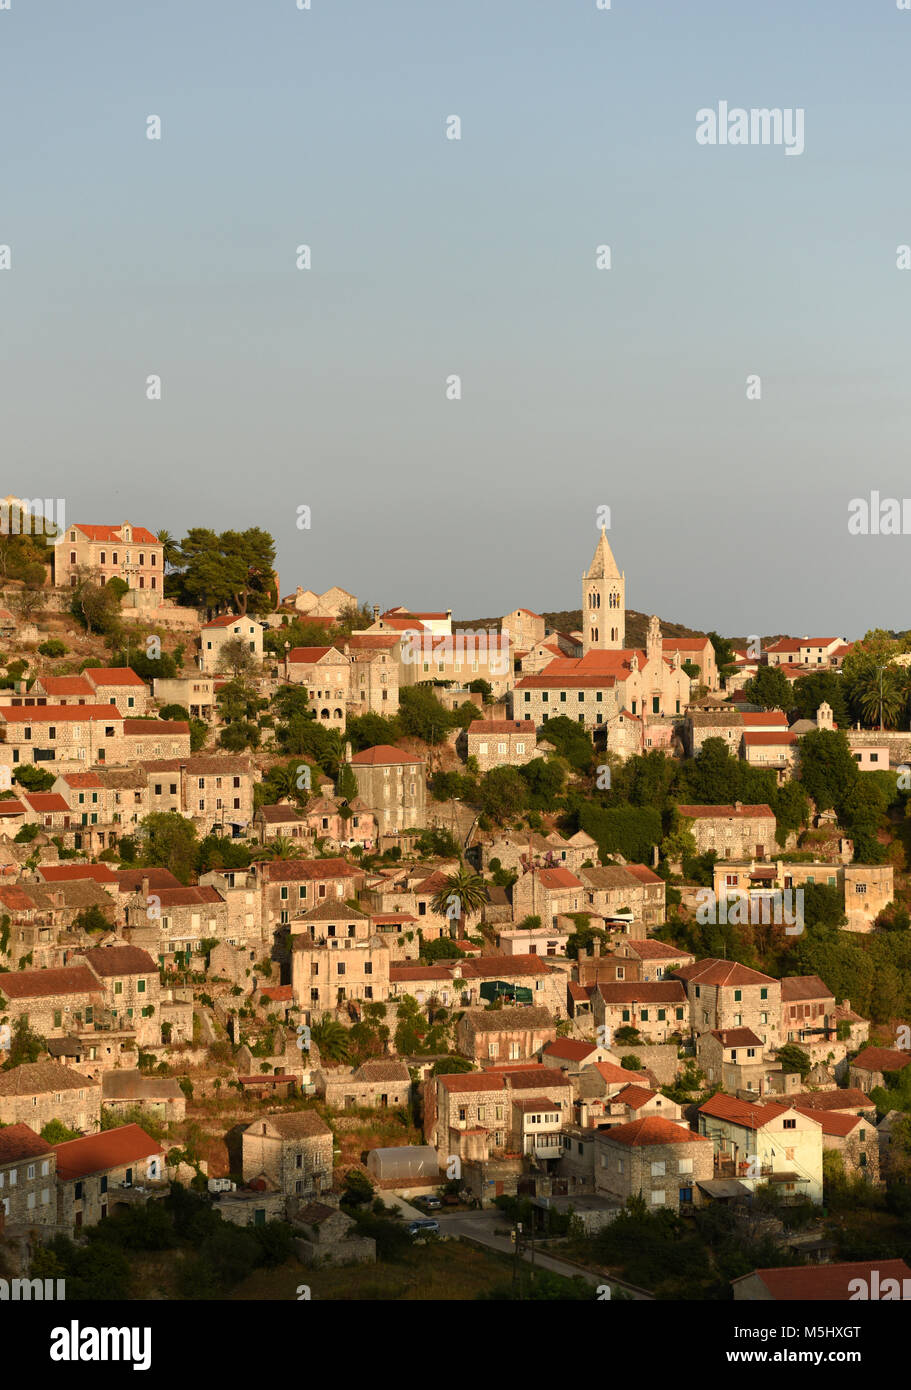 Lastovo old town, Lastovo island, Croatia - Stock Image